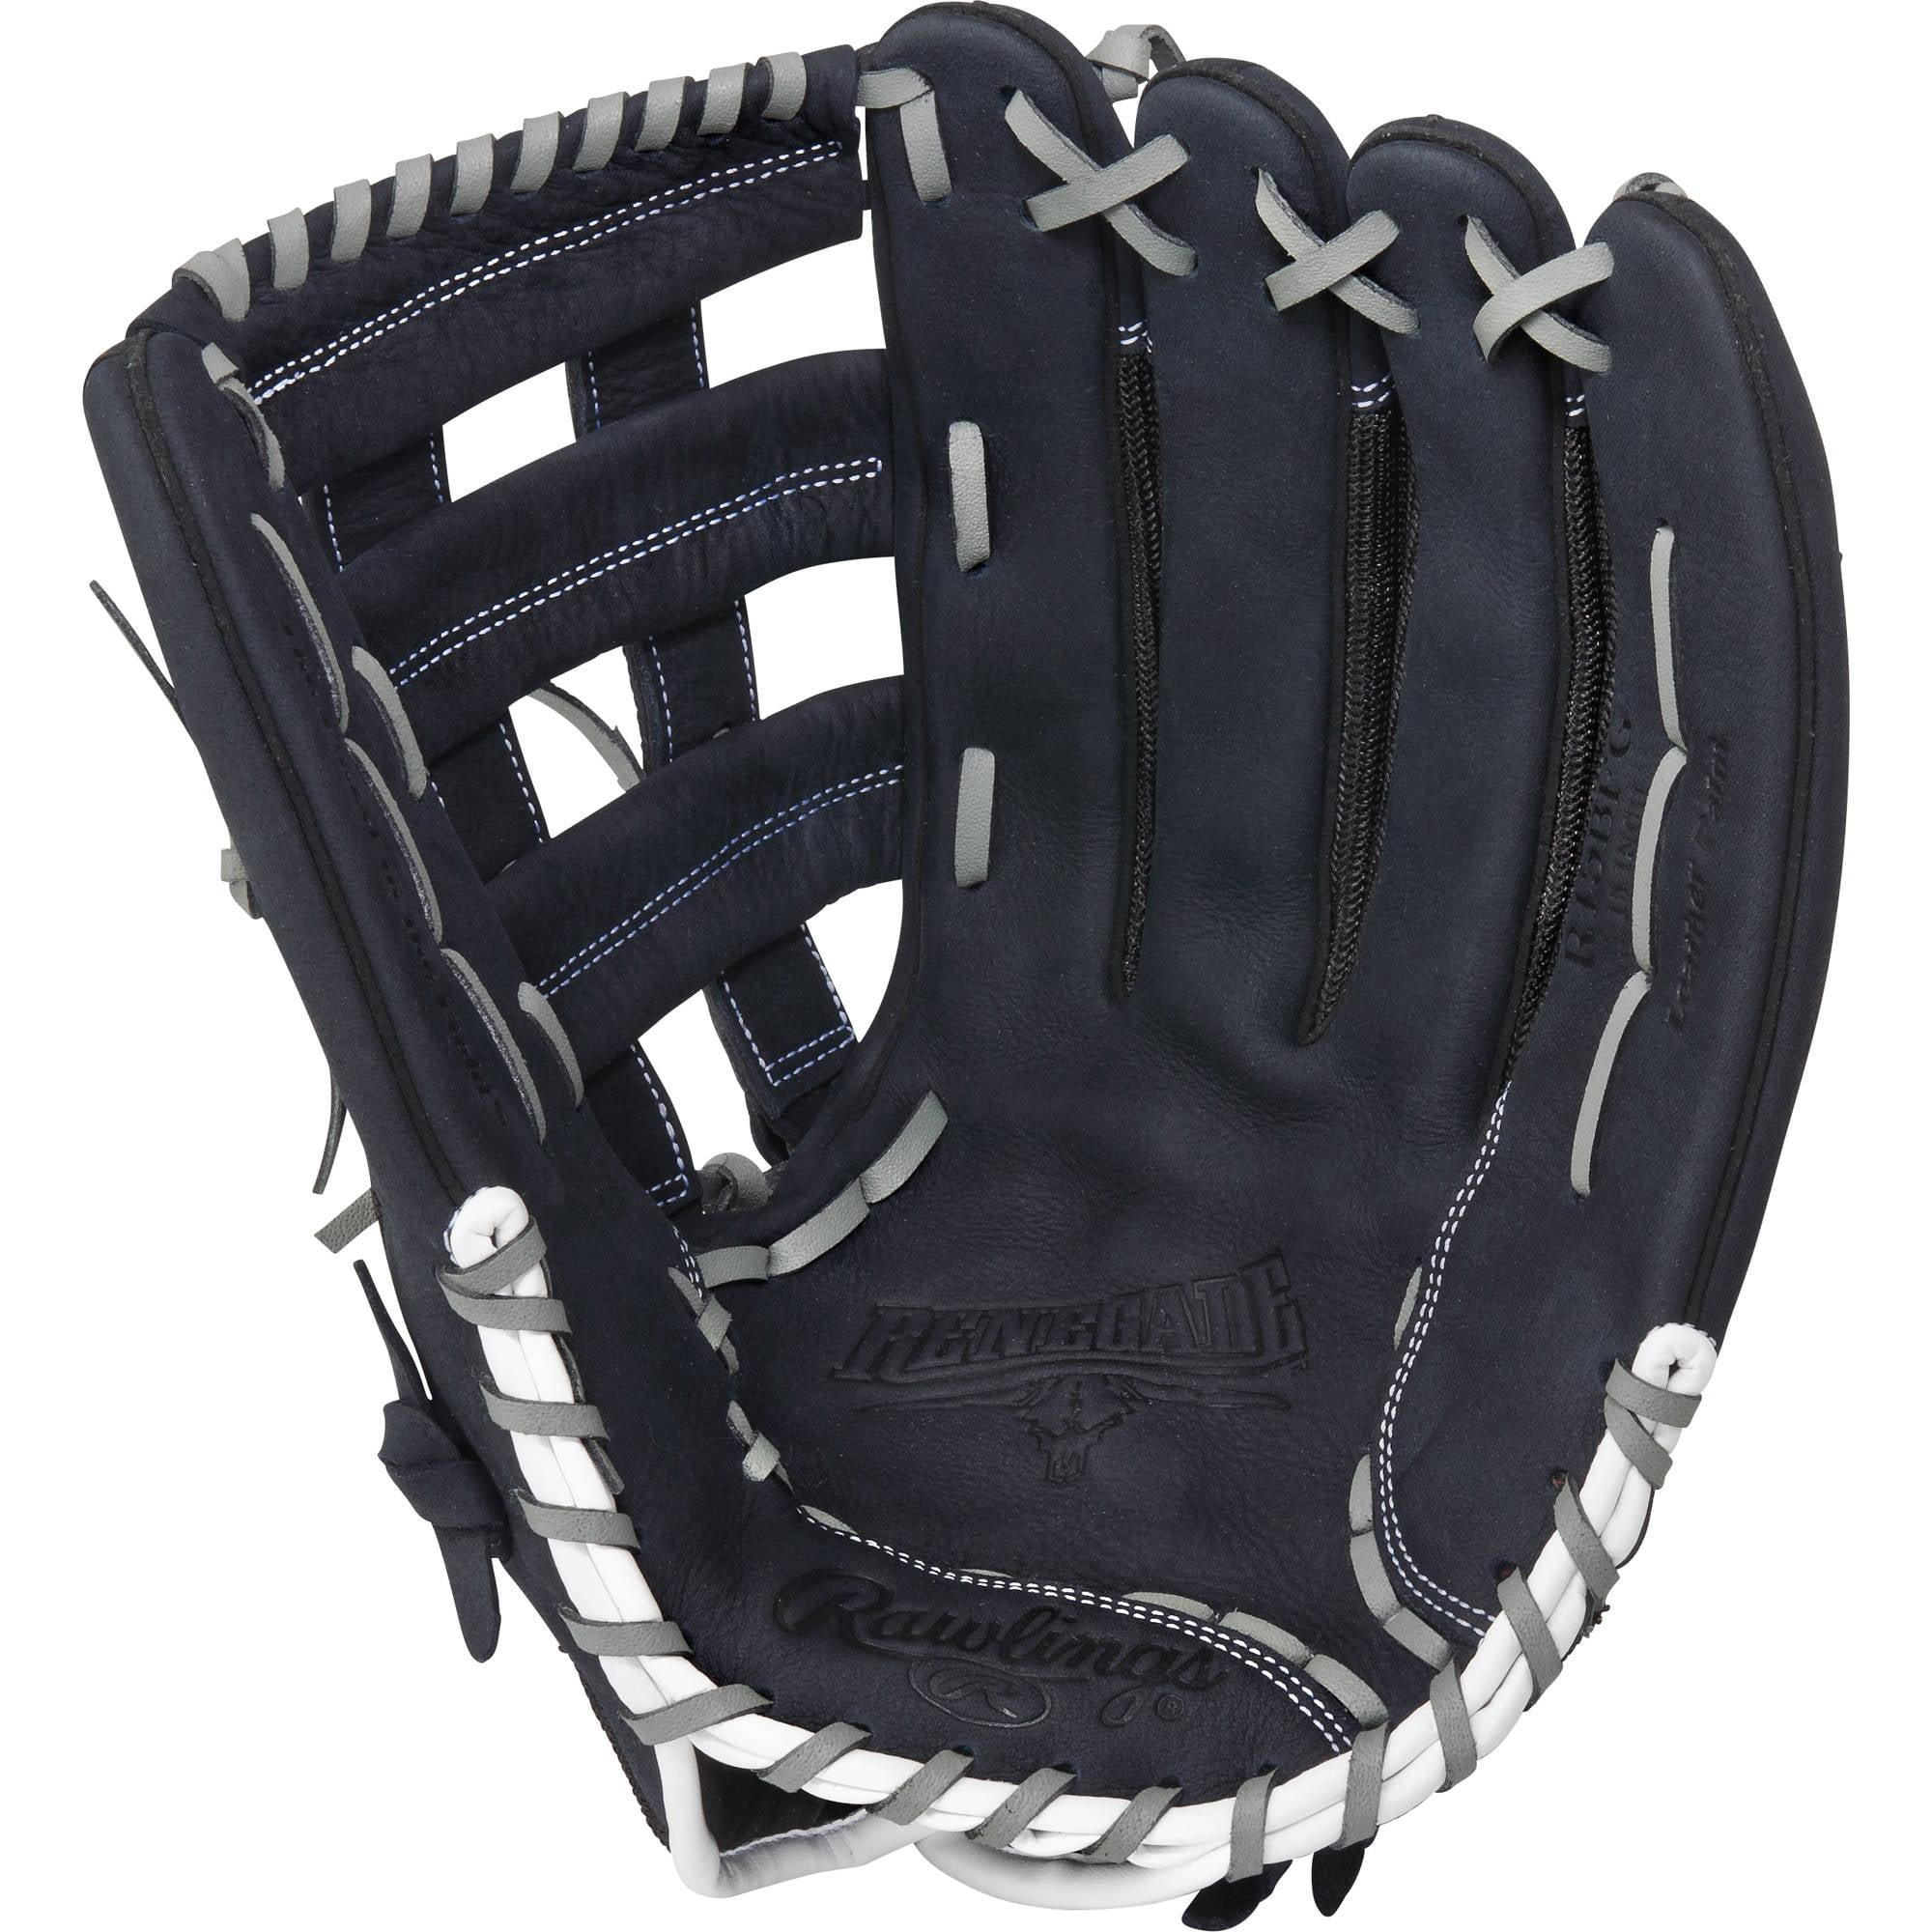 "Rawlings 15"" Renegade Series Glove, Left Hand Throwing"